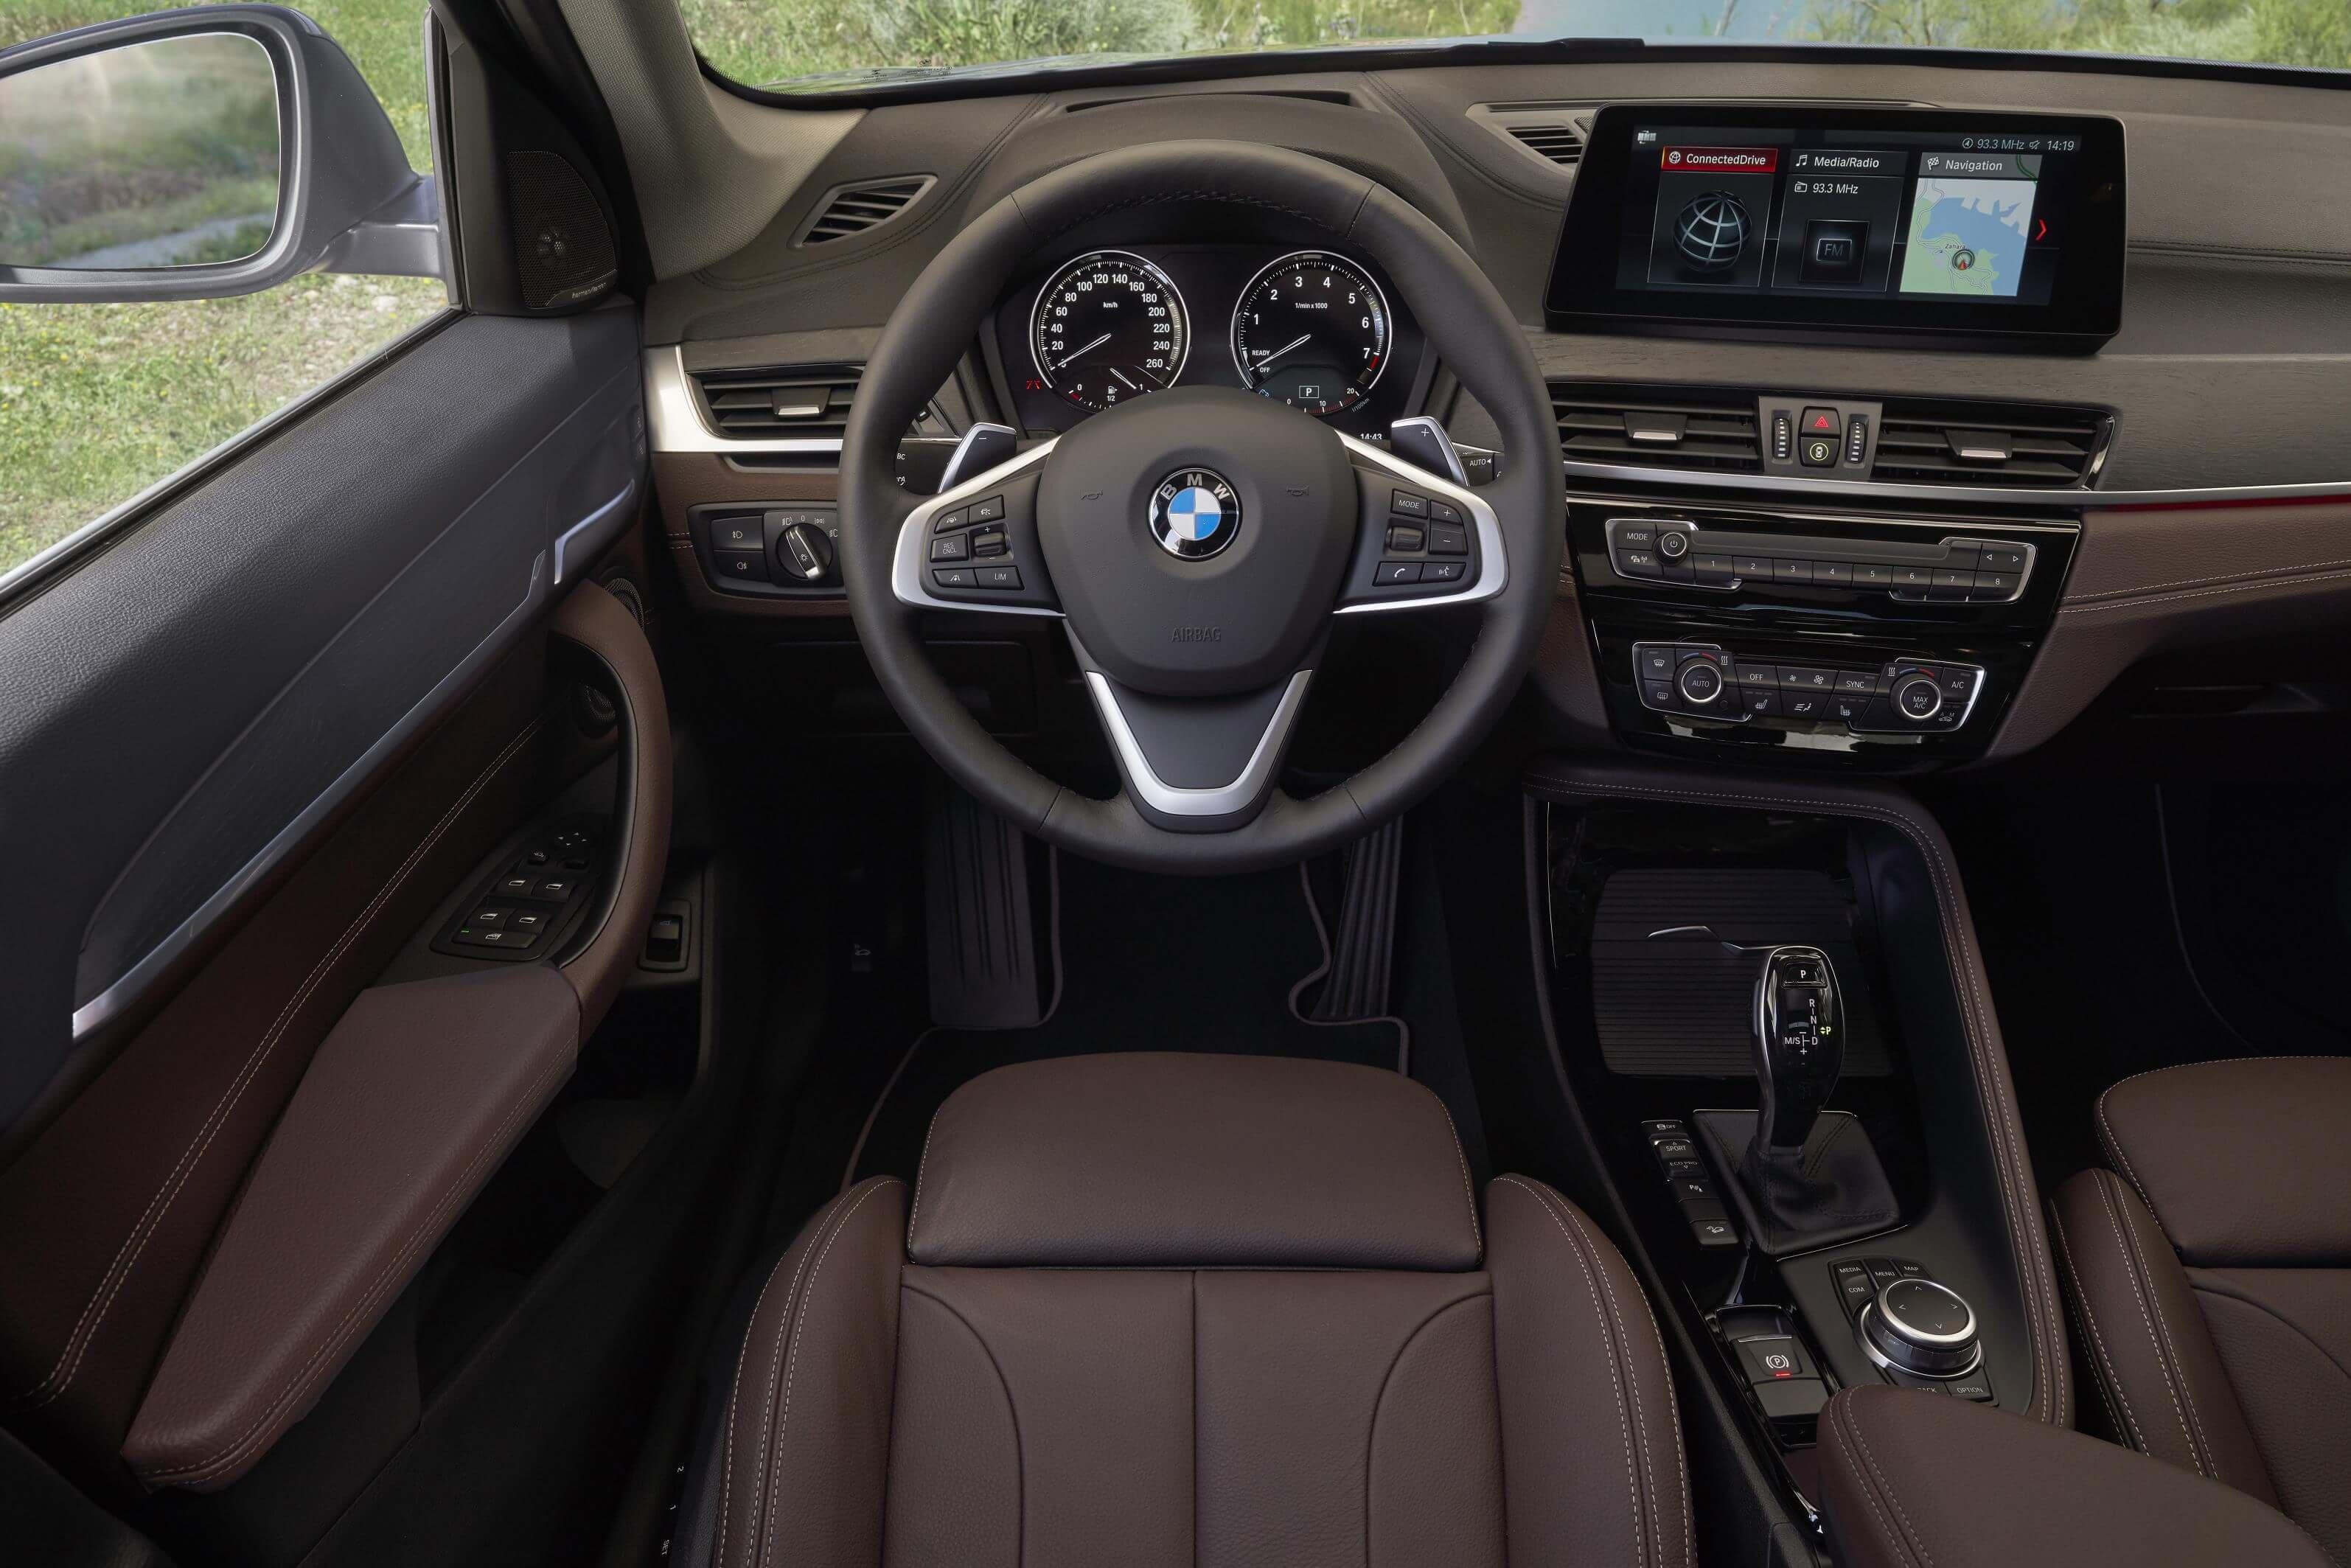 BMW X1 2019: interior